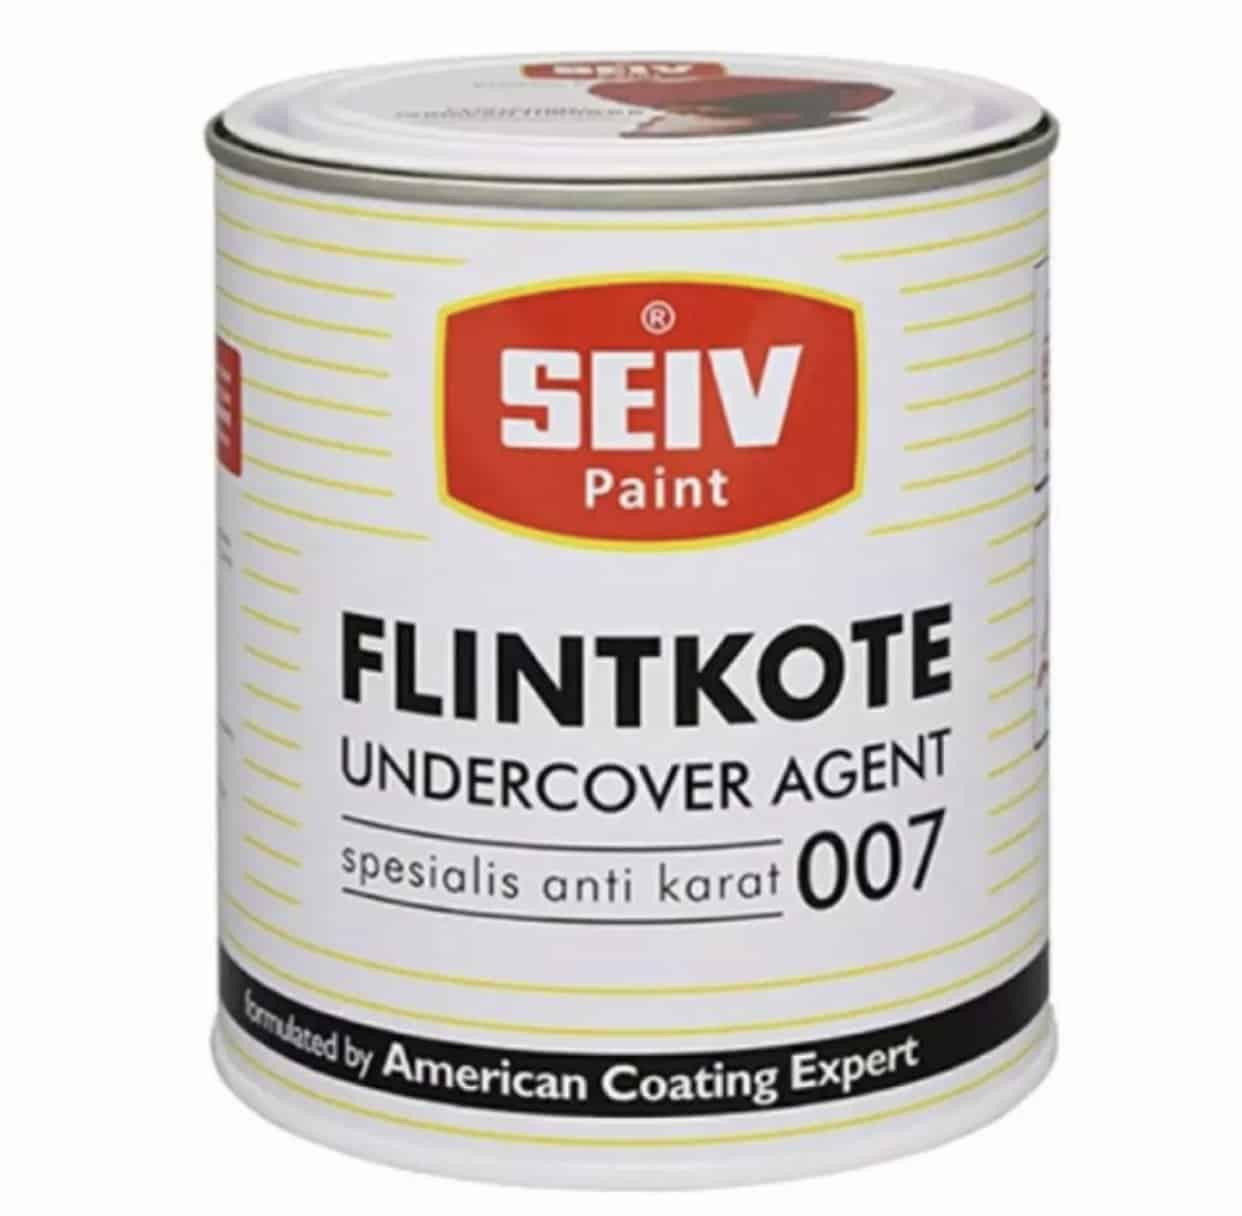 Seiv-Paint-Varian-Flinkote-Undercover